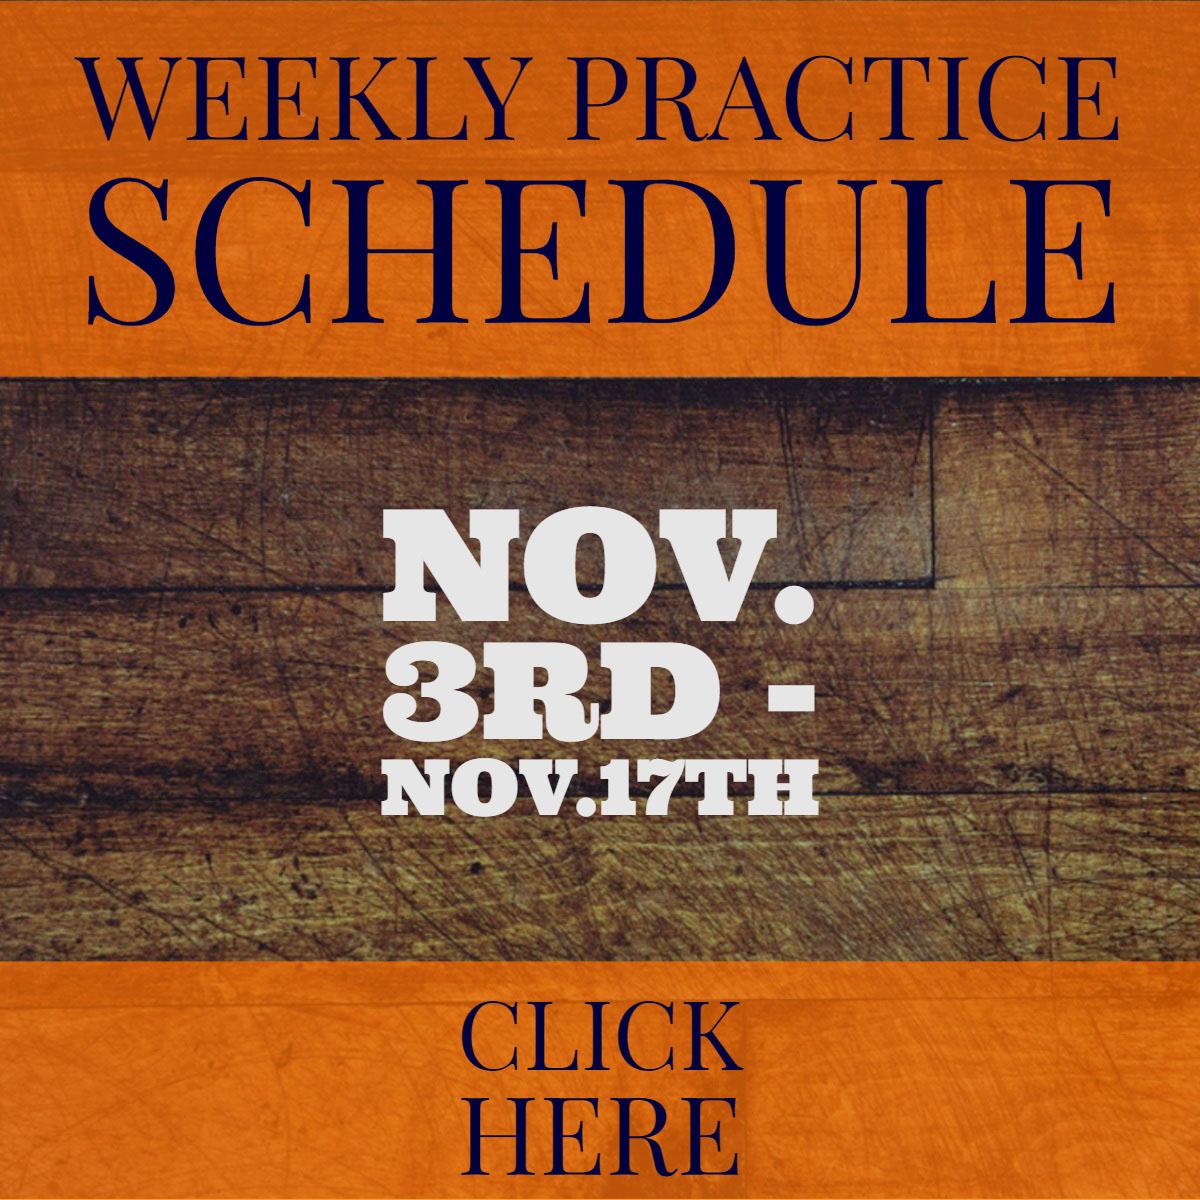 Weekly Practice Schedule Weekly Practice Schedule<P>Nov. 3rd - Nov.17th<BR><P>CLICK HERE